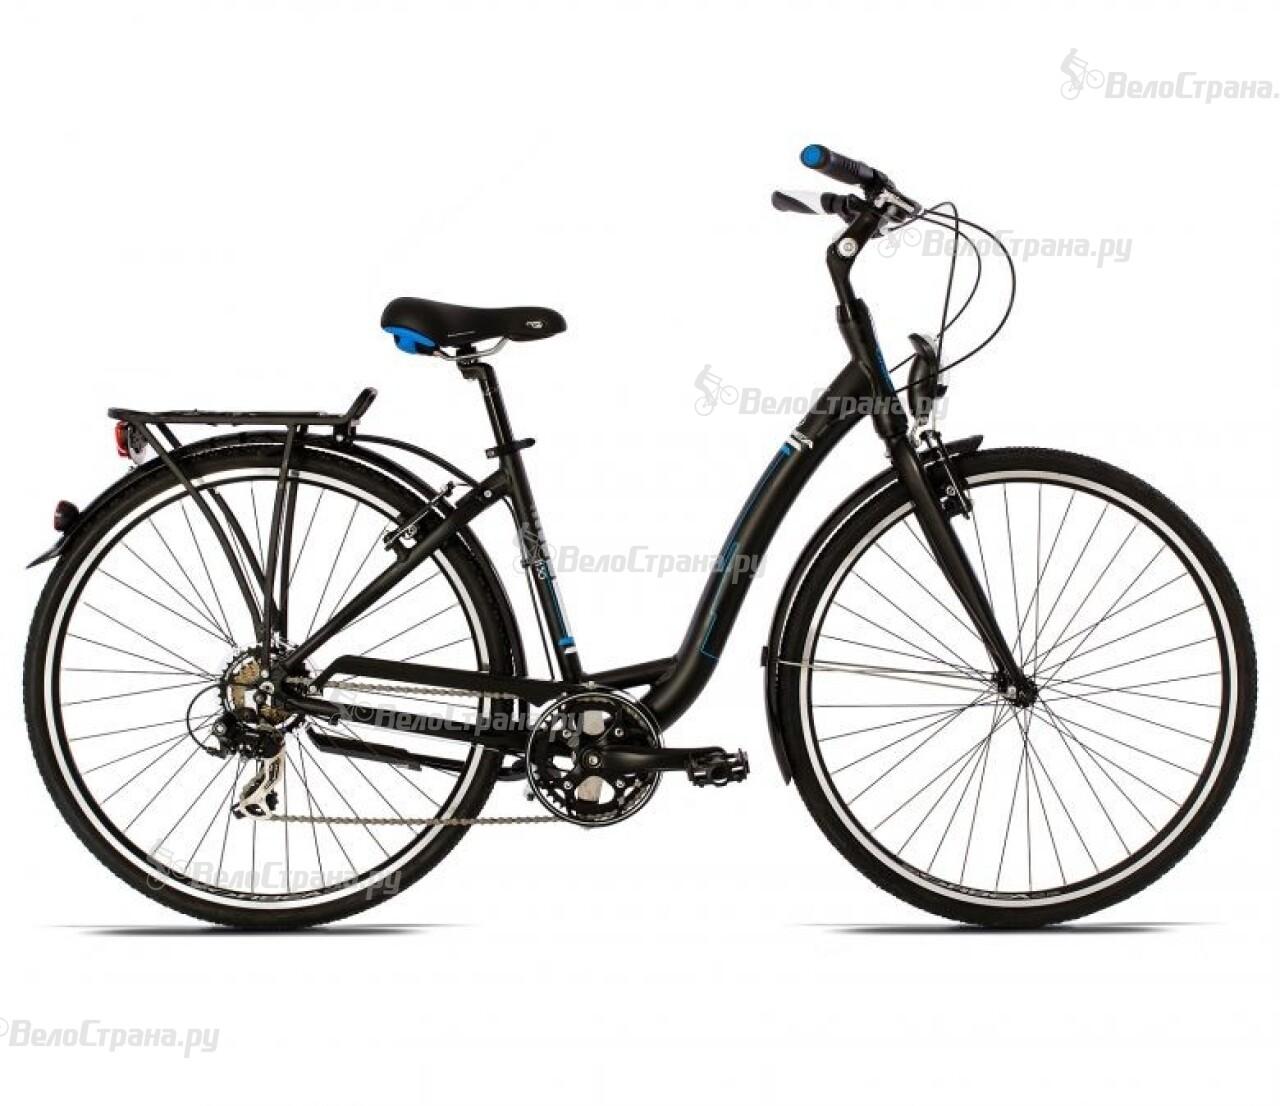 Велосипед Orbea Boulevard 50 (2014) велосипед wheeler protron 50 2014